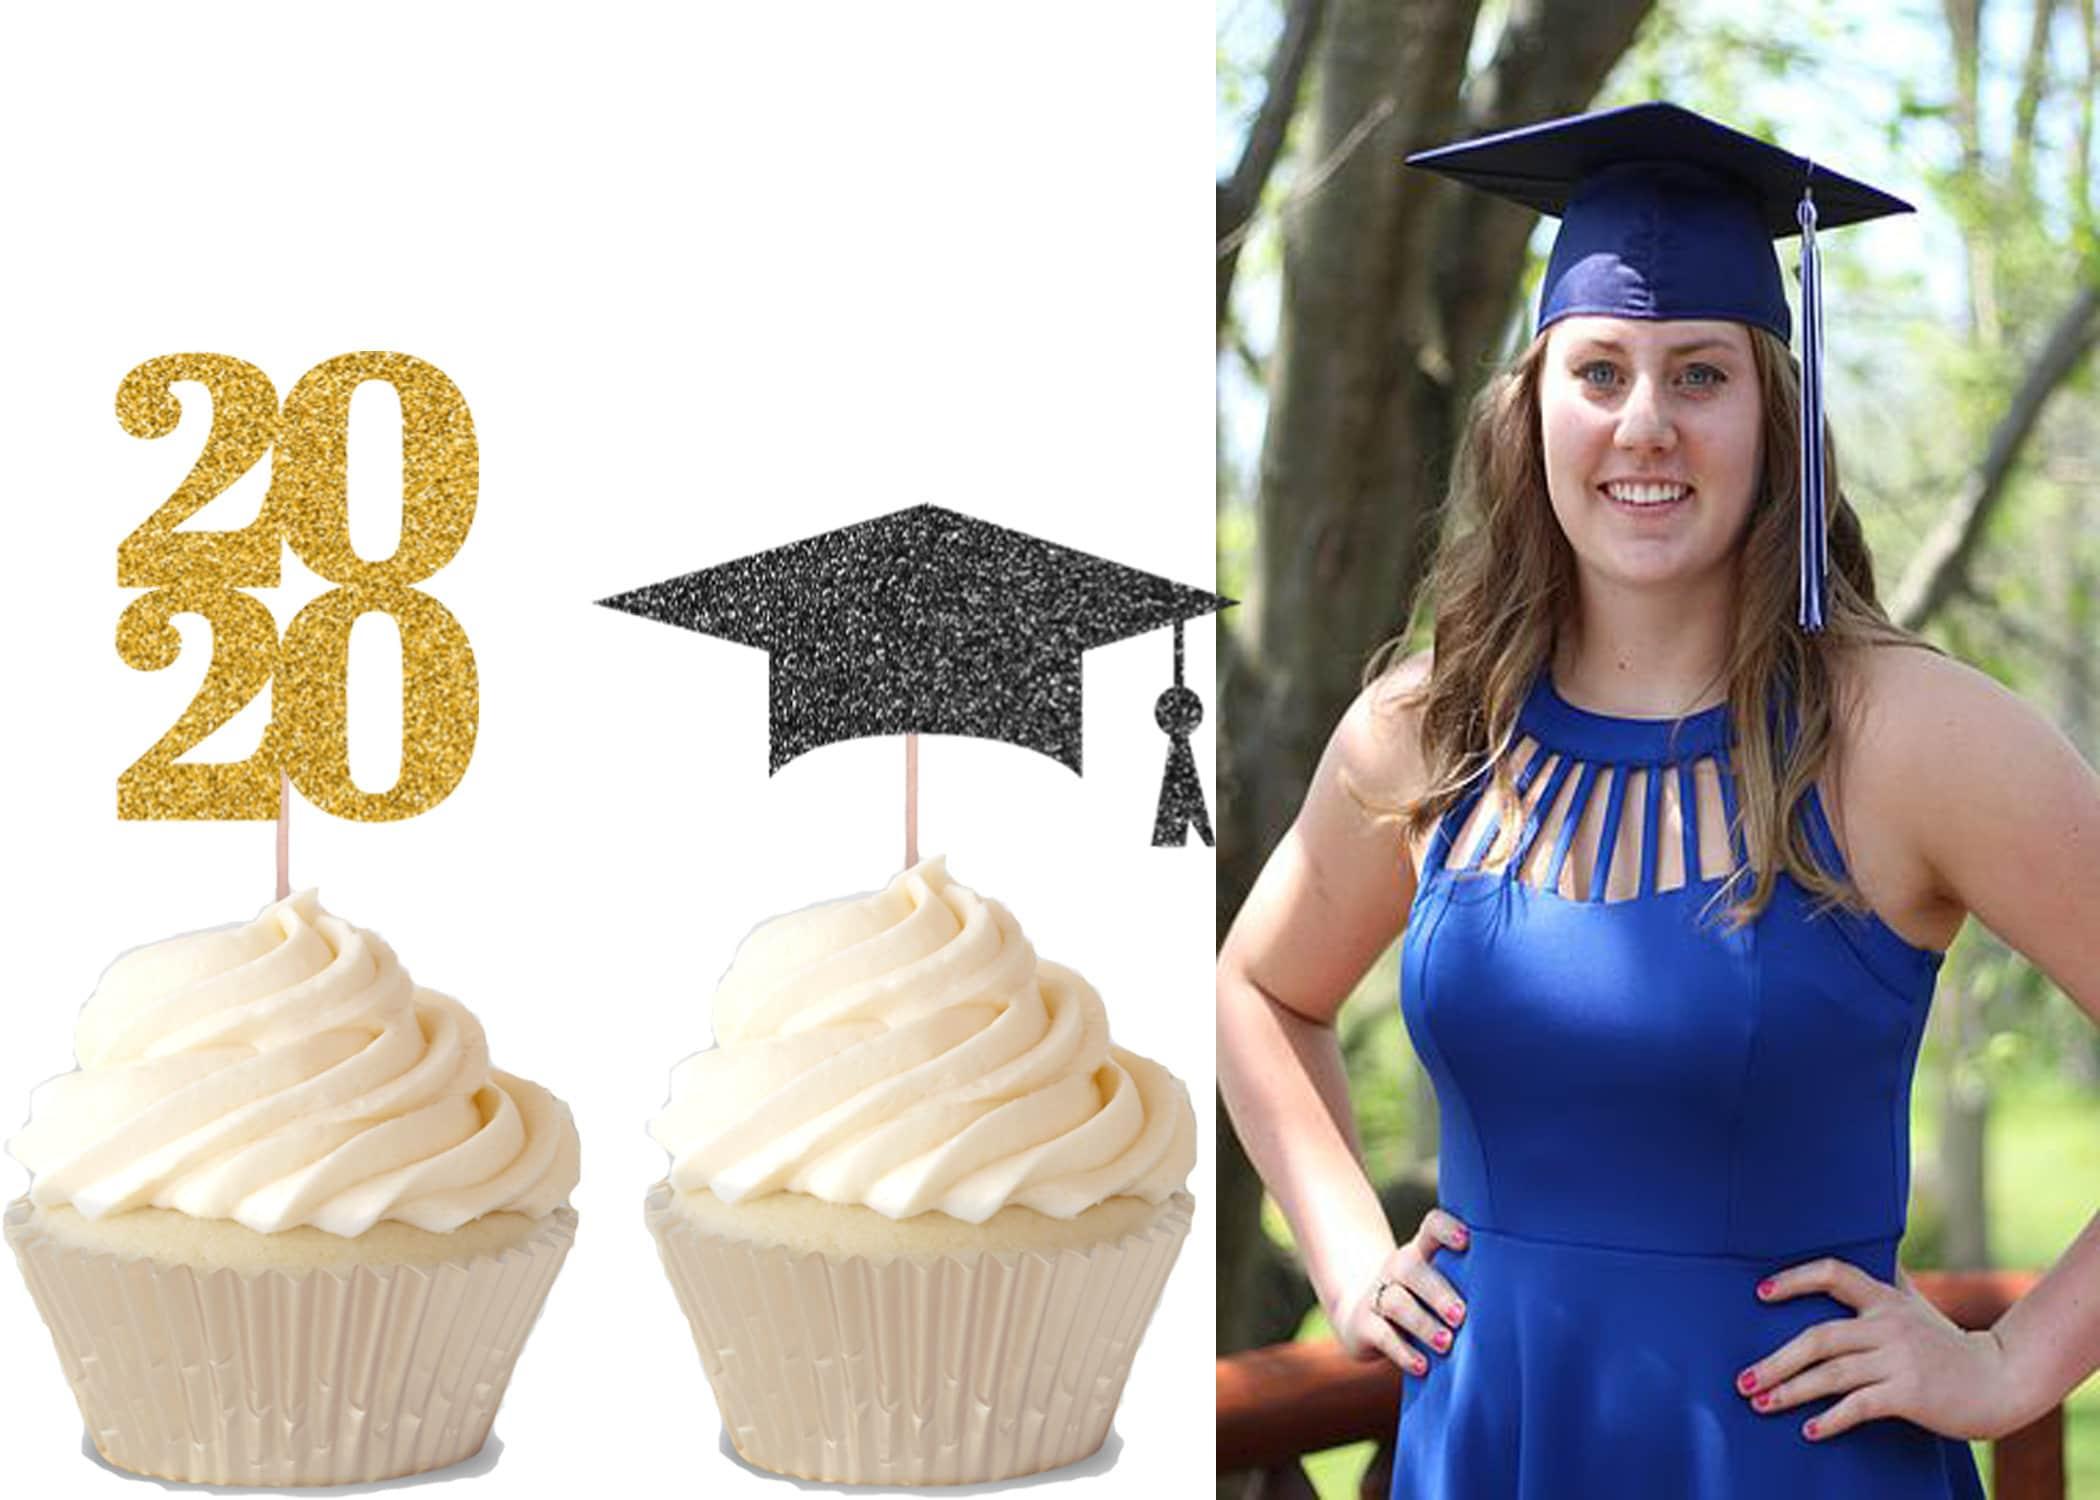 Grad Party Decor Graduation Glitter Cupcake Toppers Personalized Graduation Graduation Party Grad Cupcake Toppers Set of 12